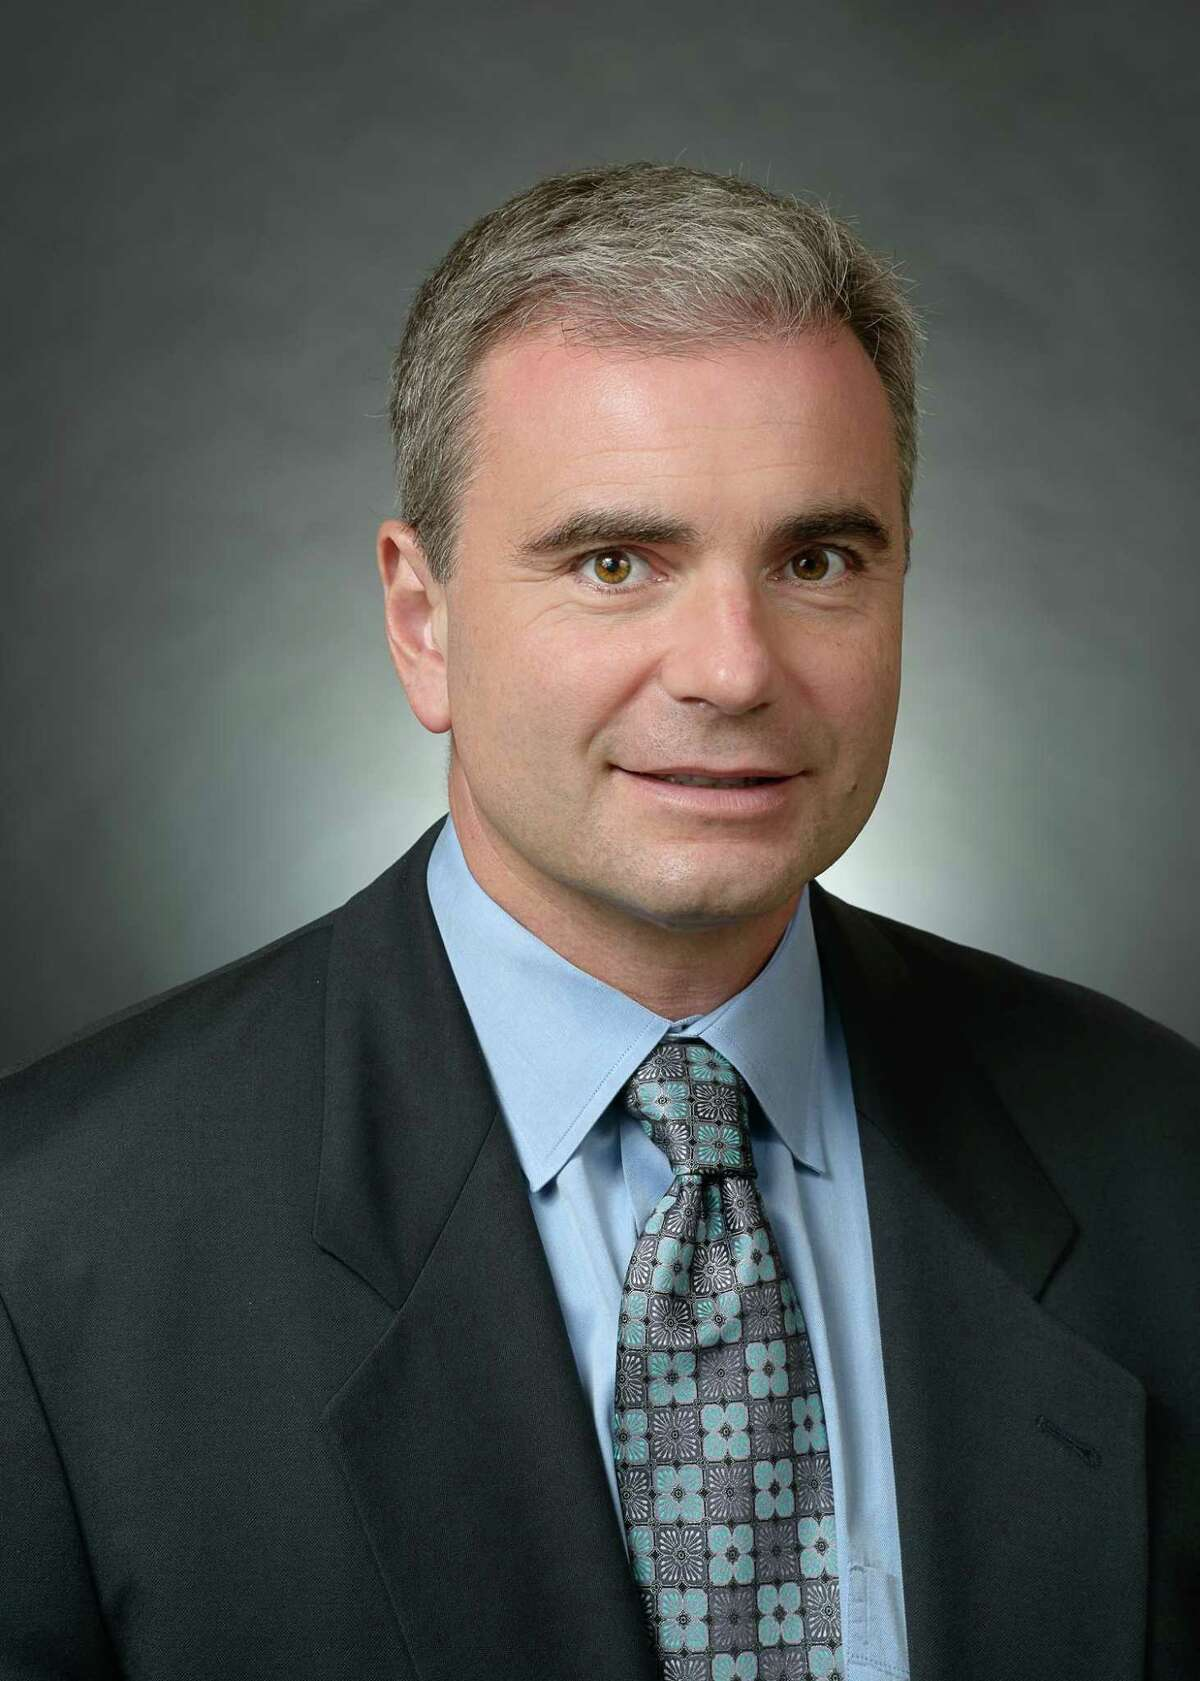 Nicola Tarzia, Stamford Board of Education candidate